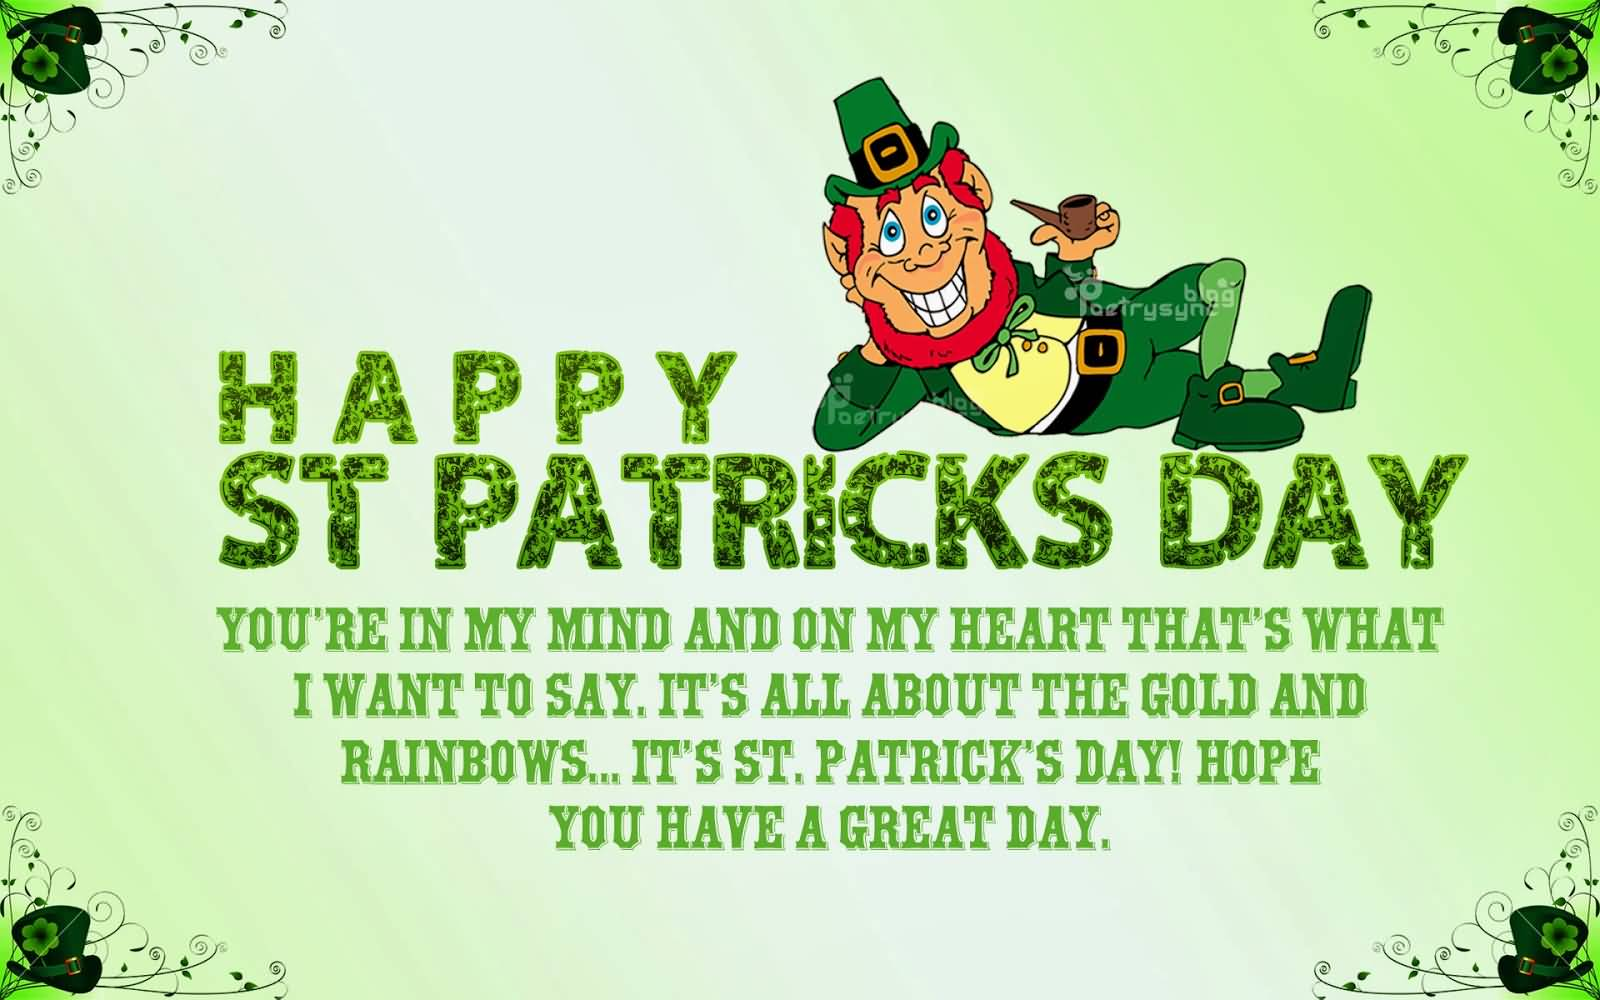 St. Patrick's Day Wish 06